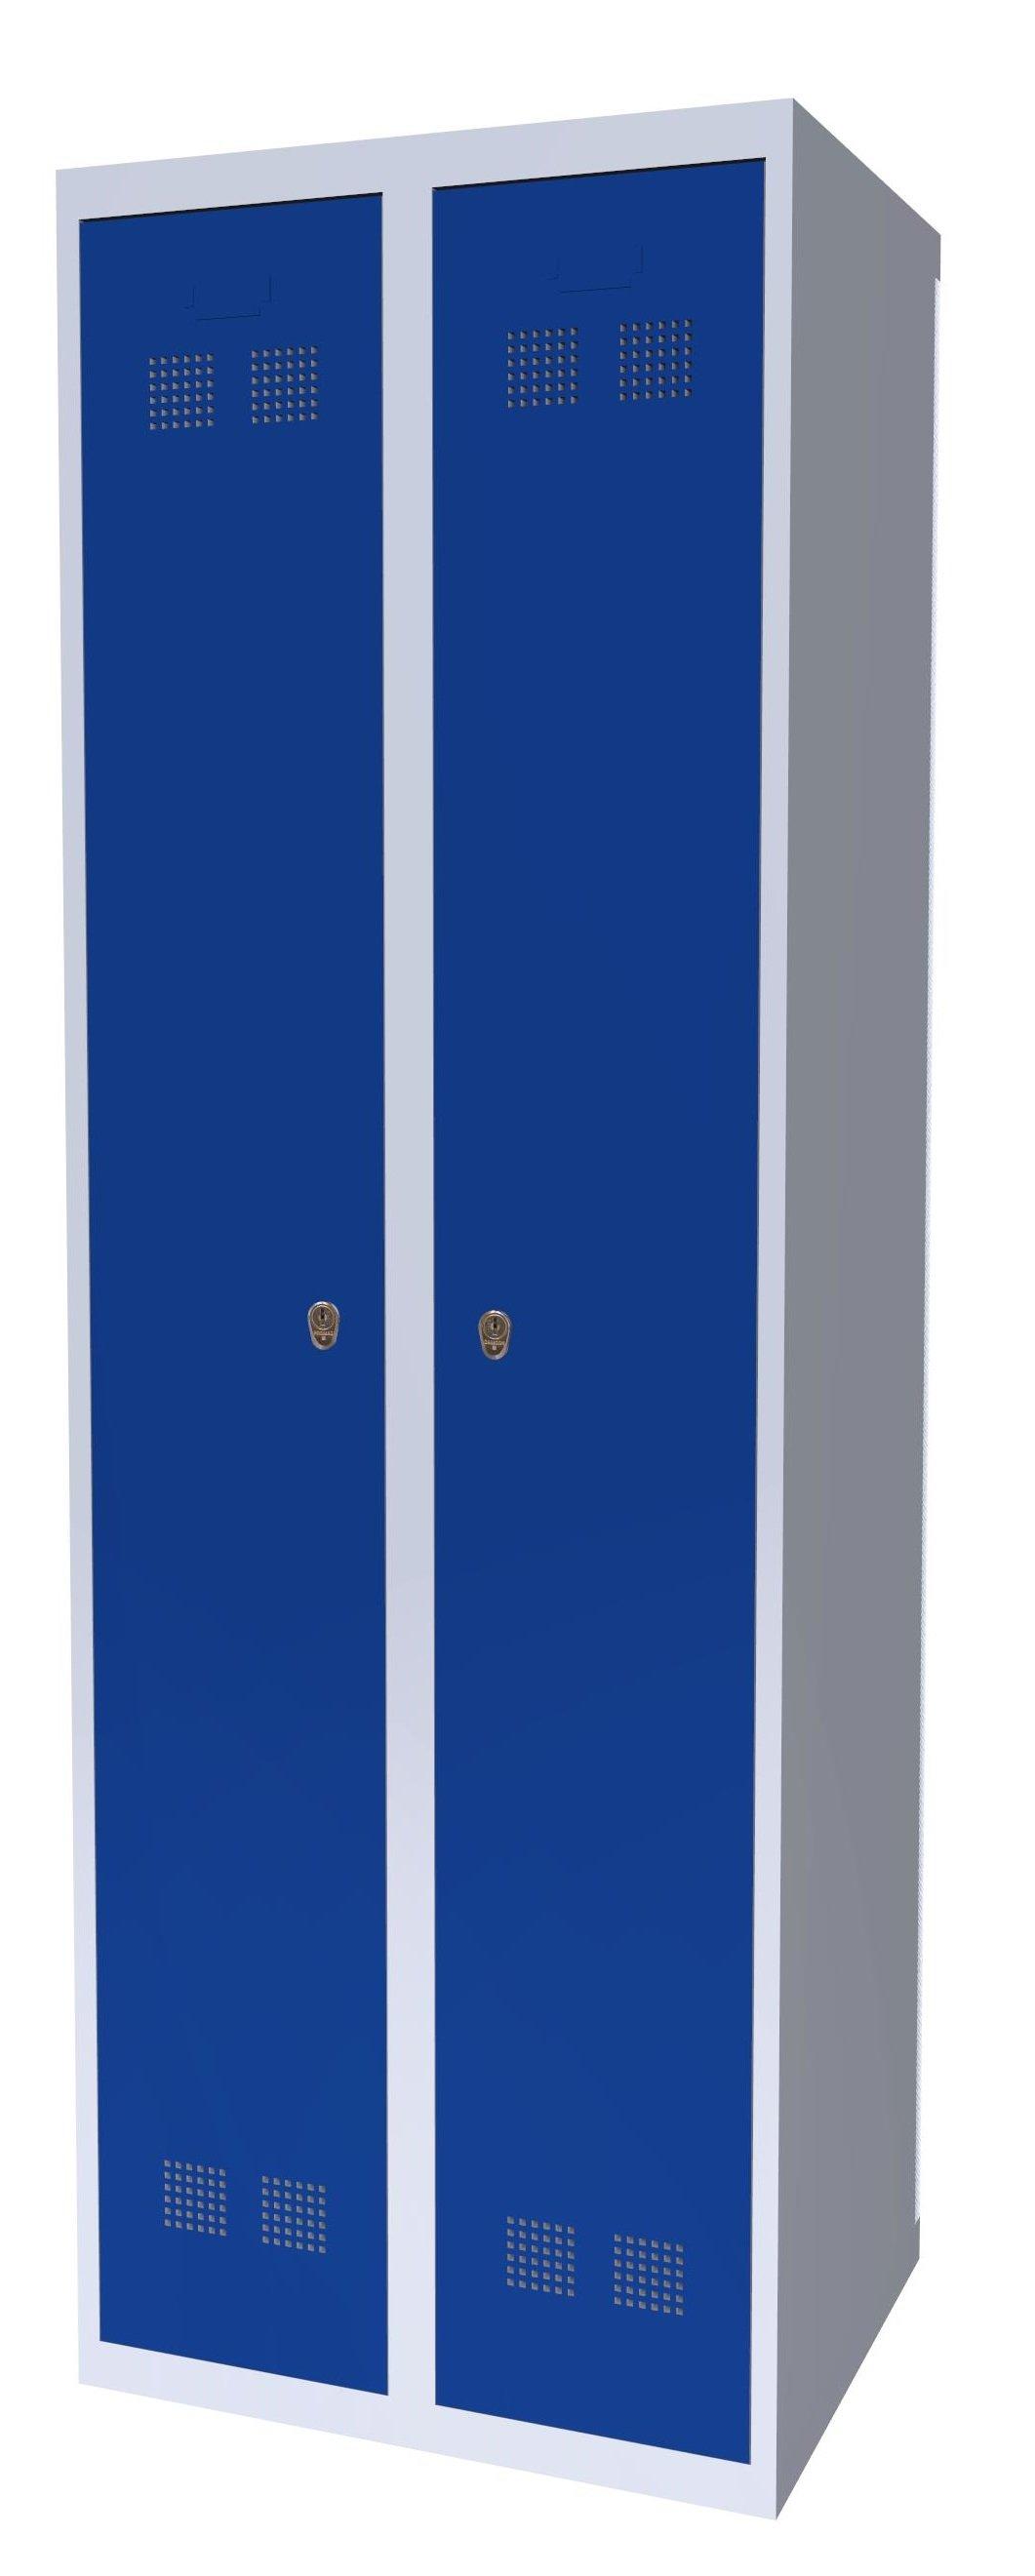 Szafka ubraniowa pracownicza SUP E300-02 7035/5005